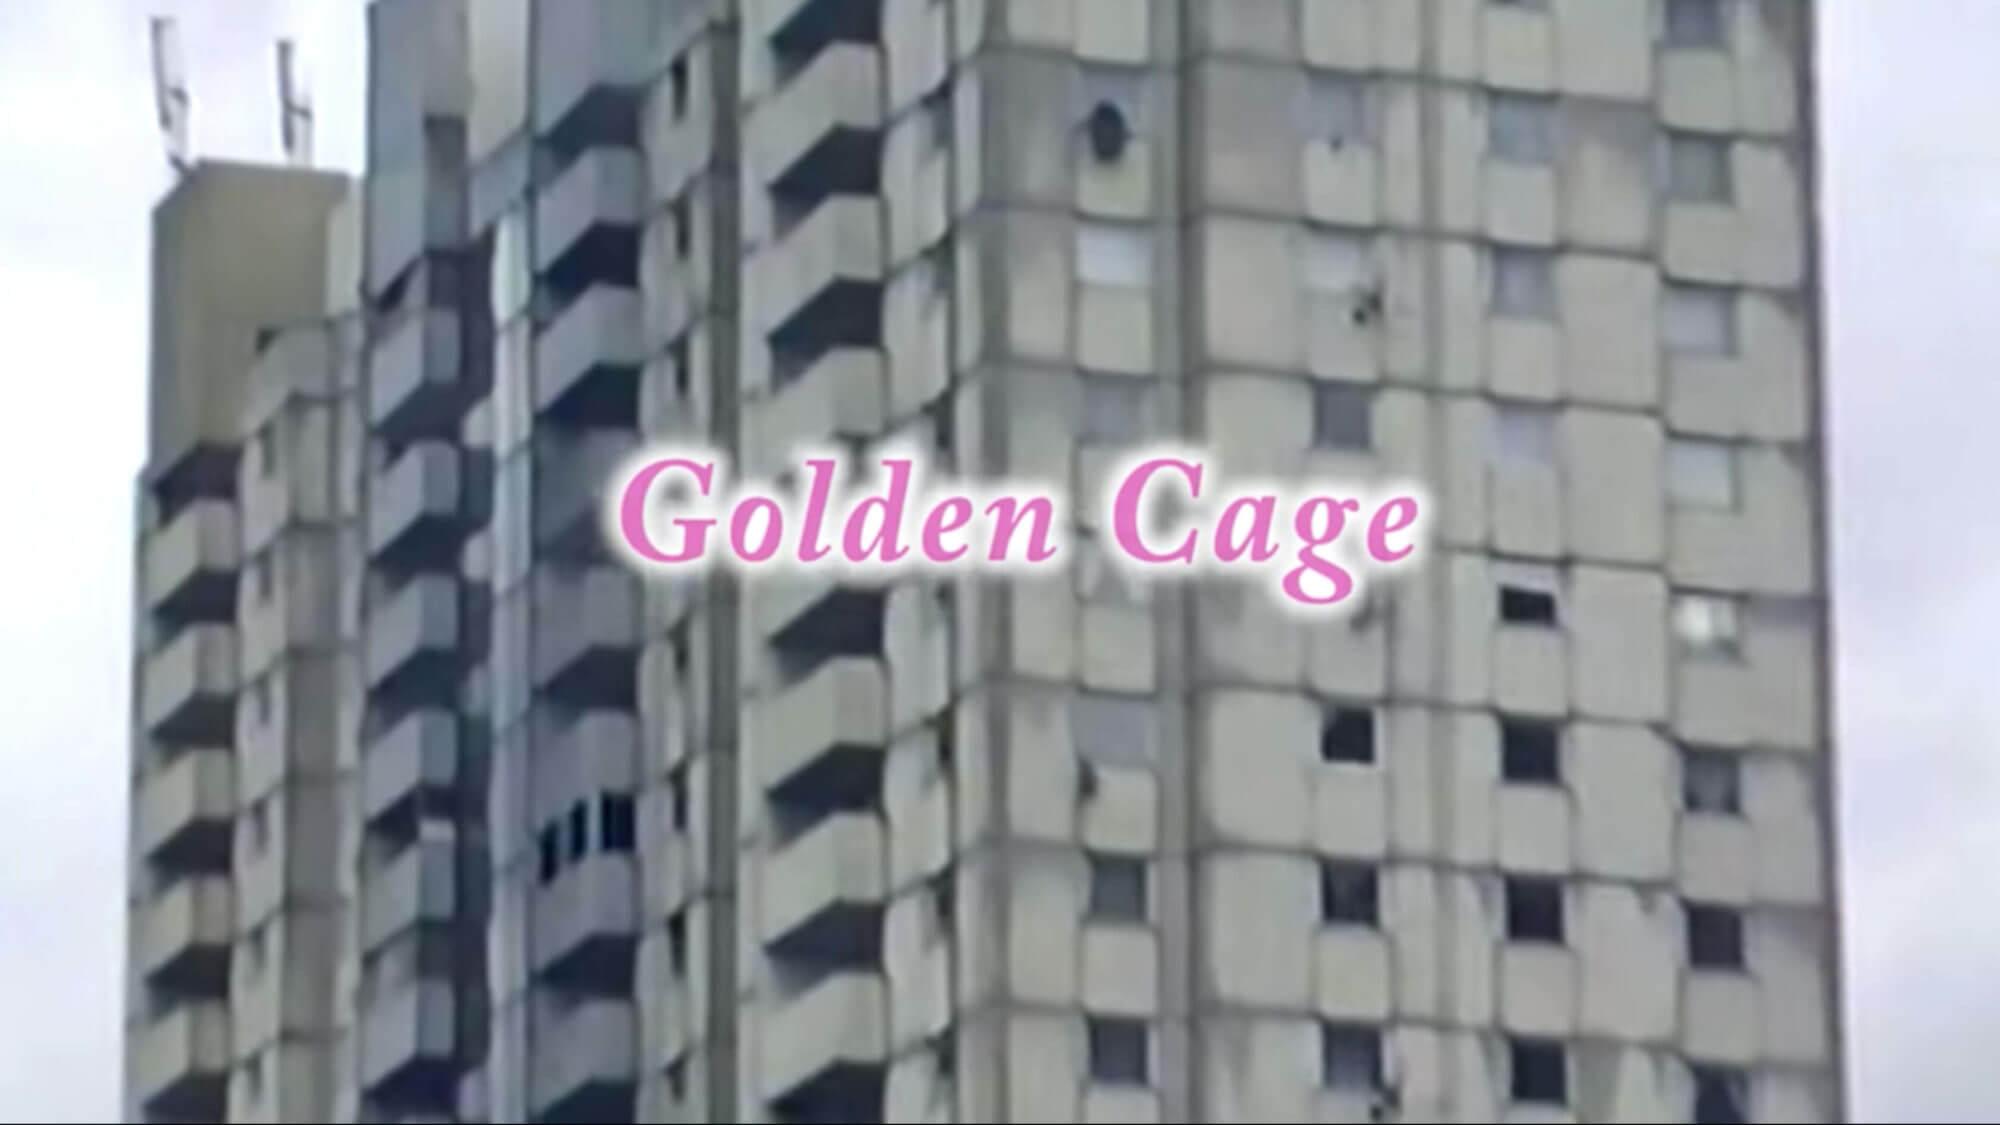 nilufer yanya golden cage01 1